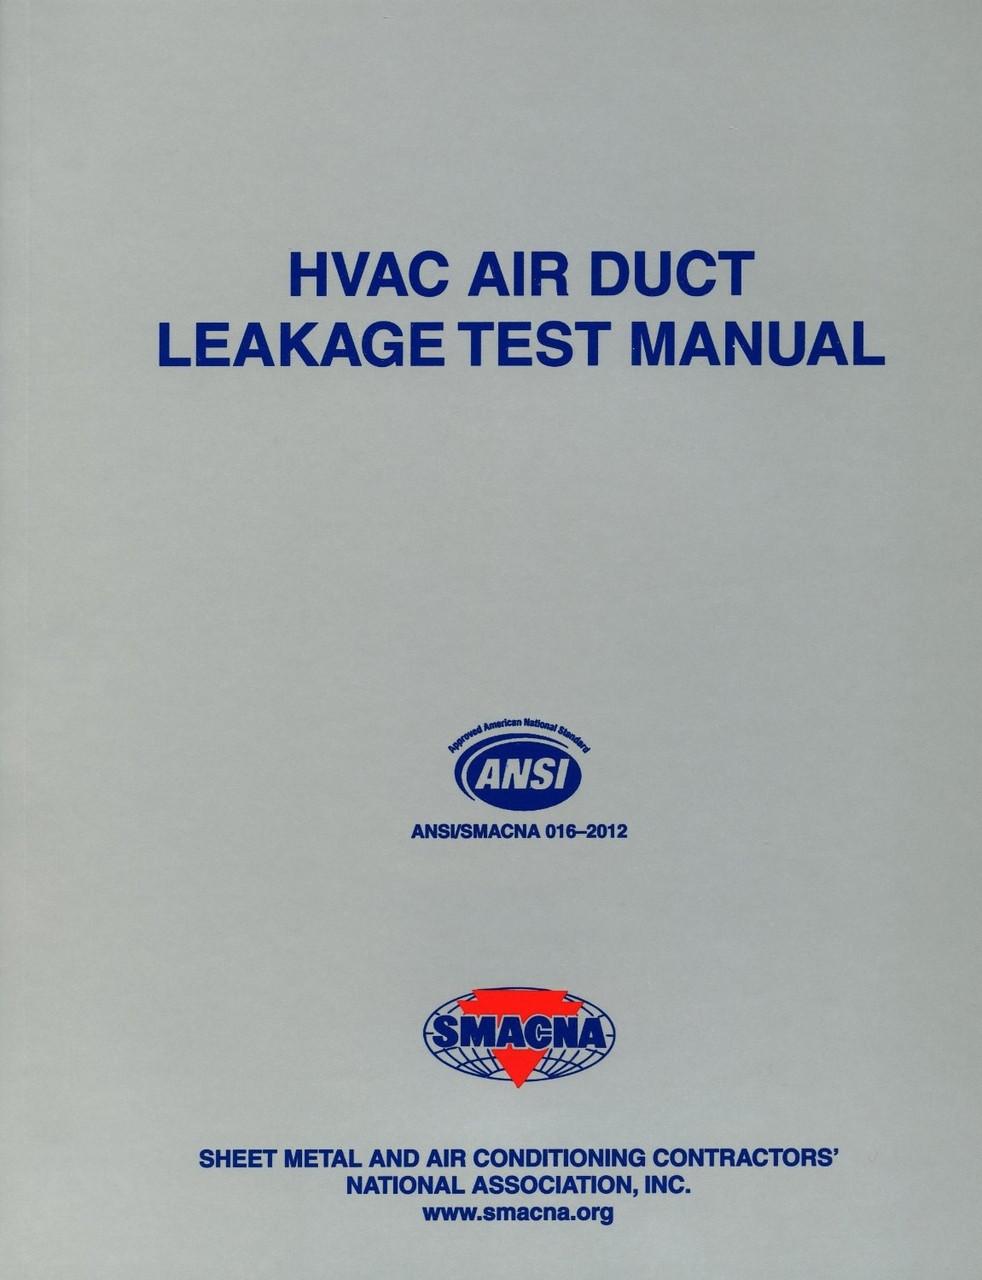 Hvac Air Duct Leakage Test Manual Smacna 1143